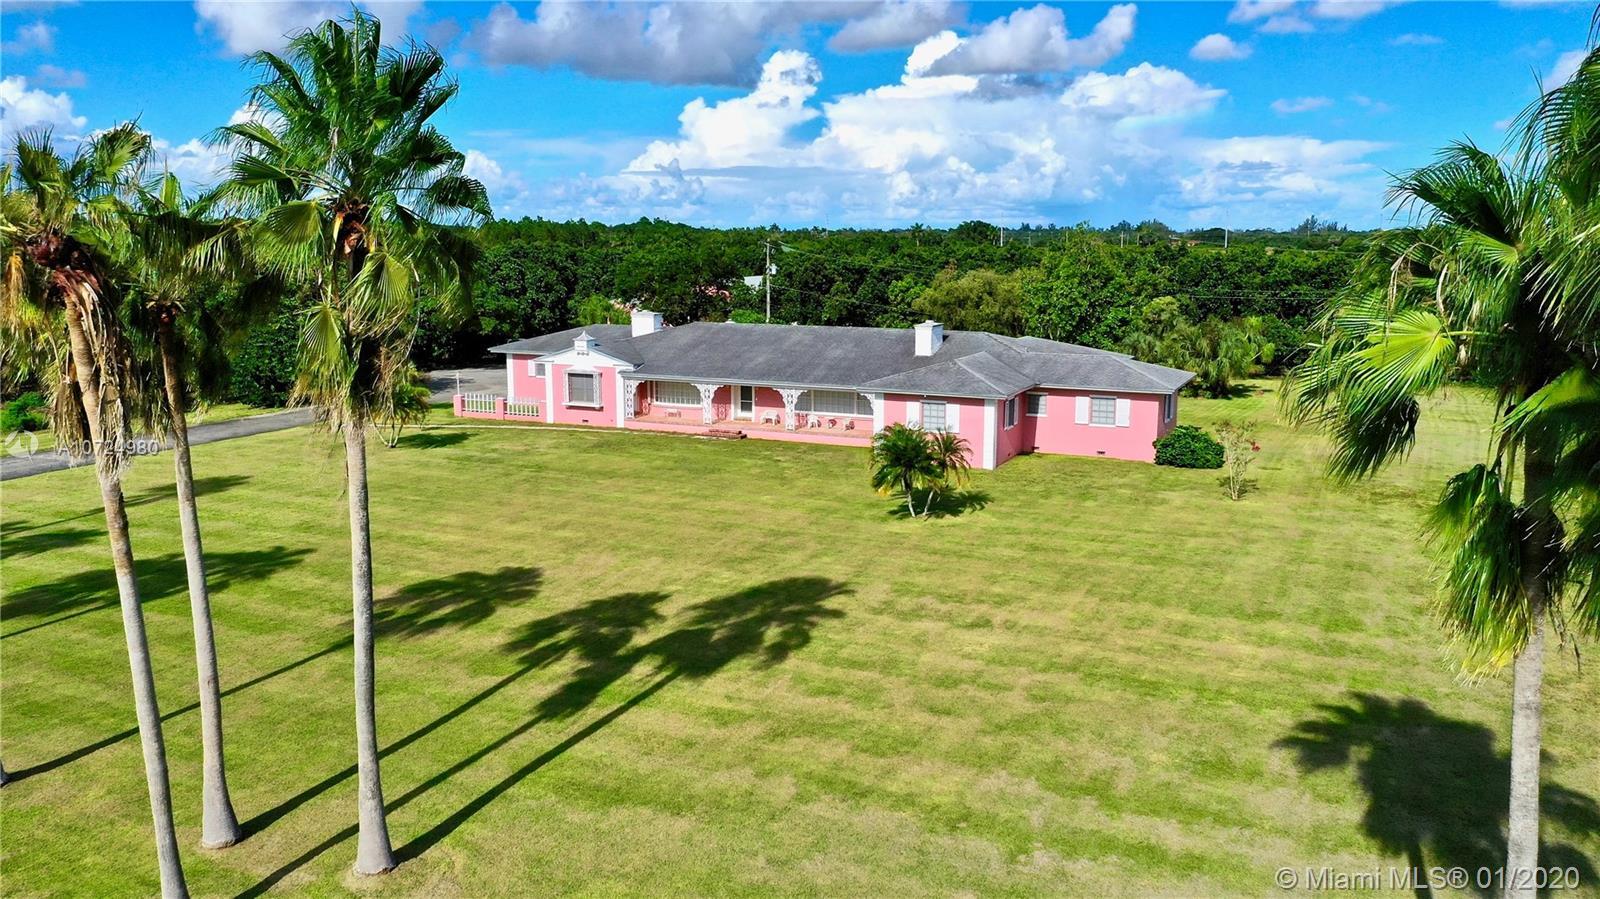 24155 SW 152 Ave, Homestead, Florida